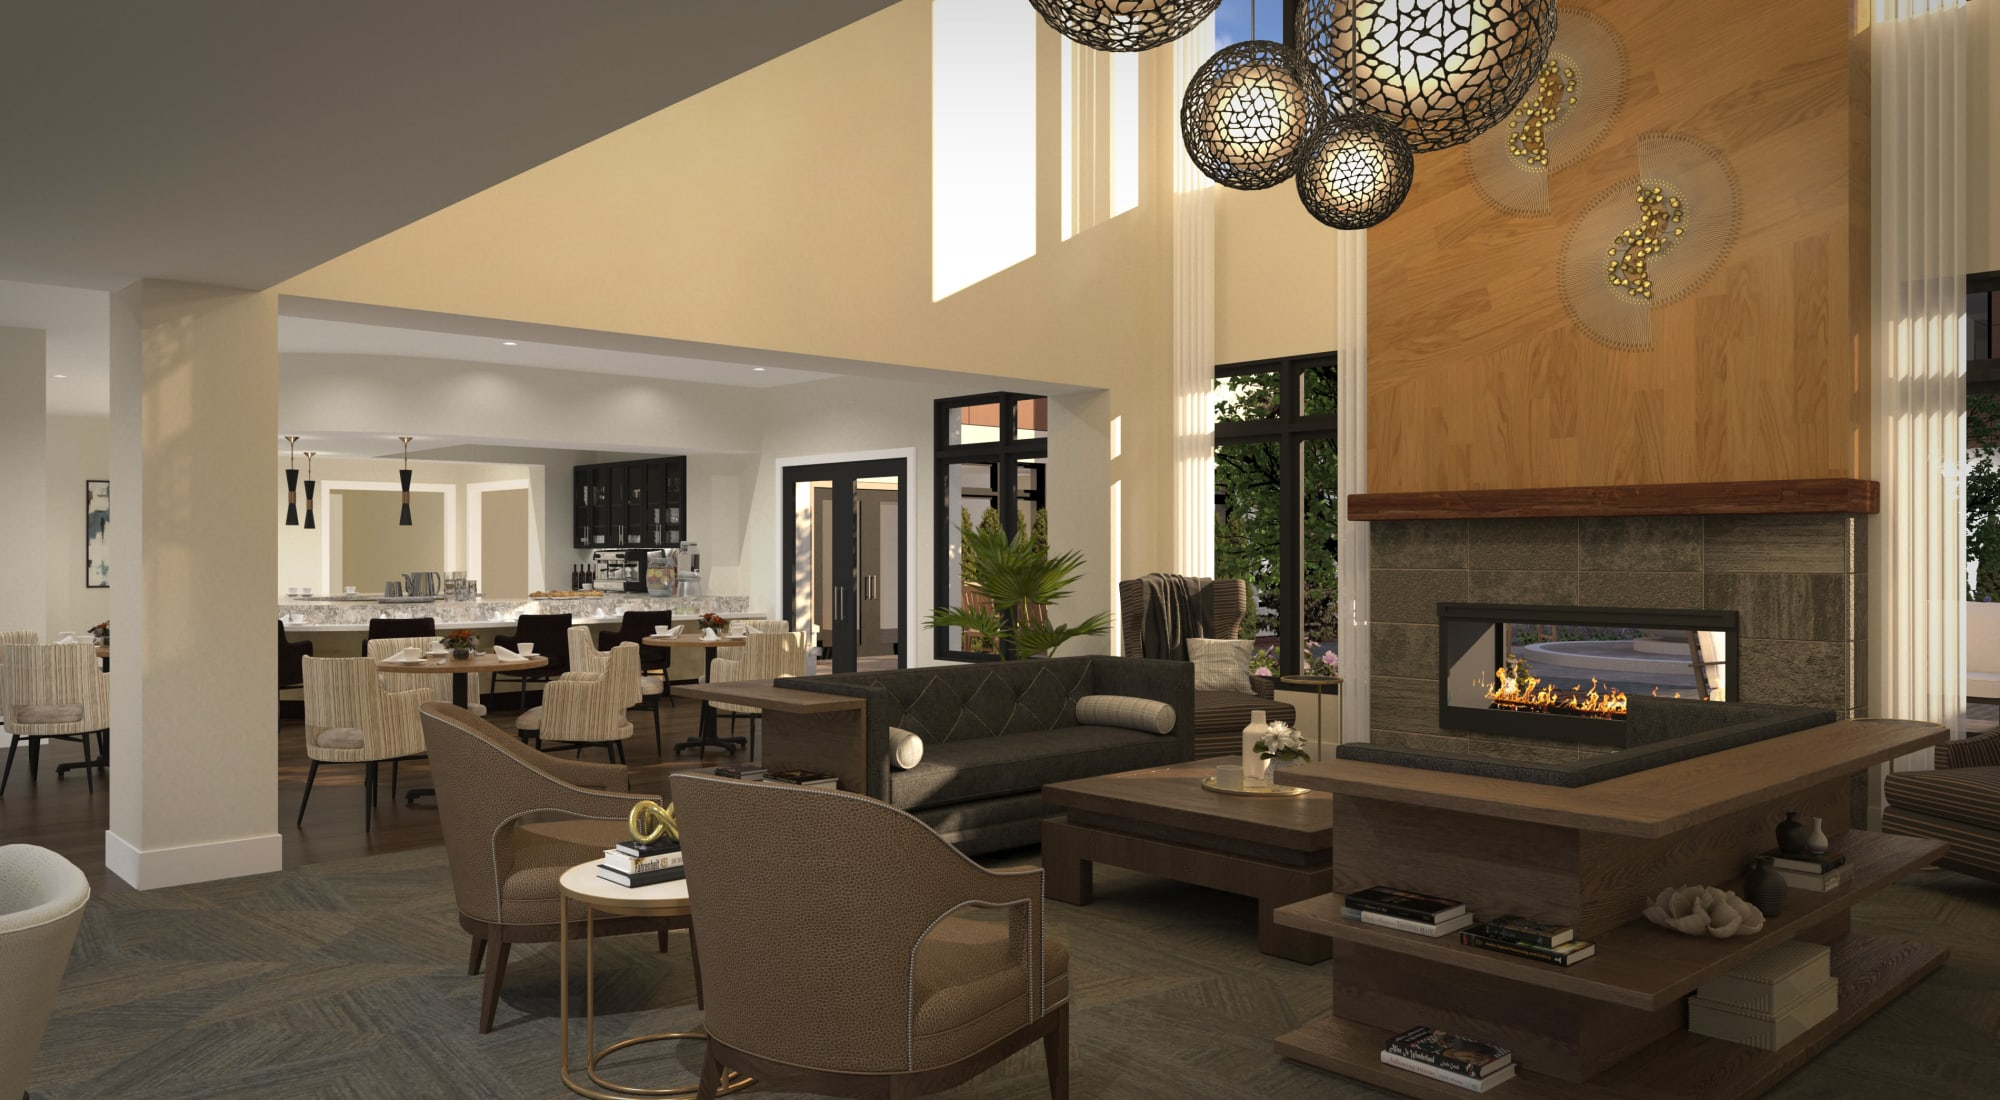 Lounge area at Maplewood at Princeton